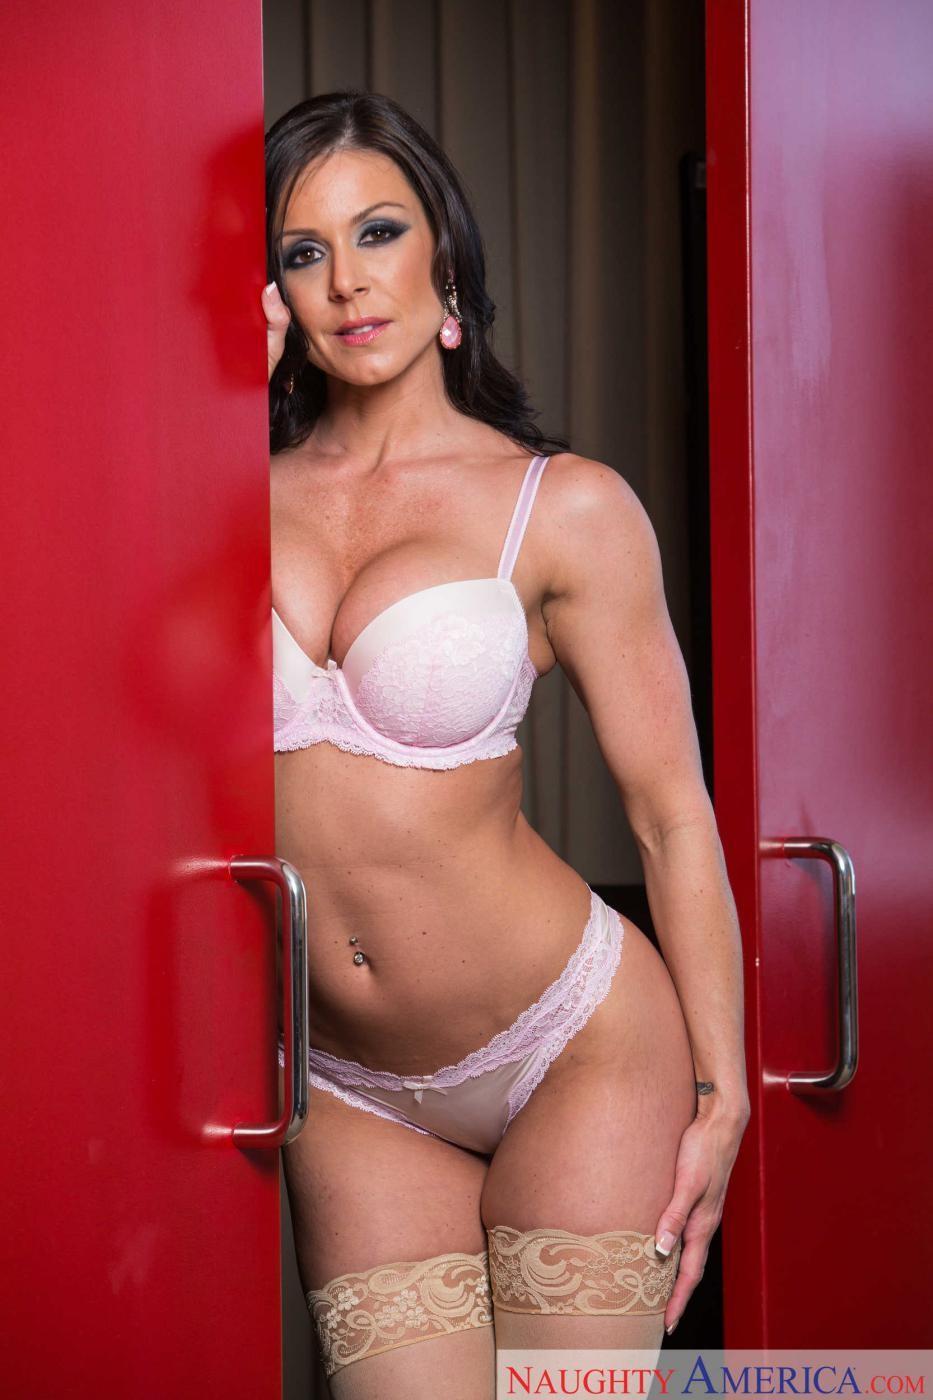 Kendra Lust - Галерея 3484506